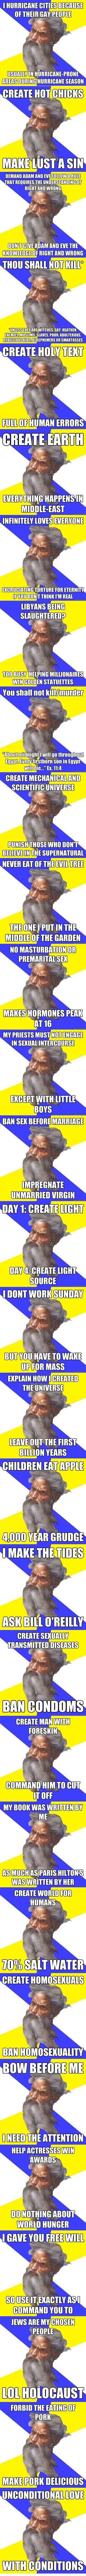 It all makes sense